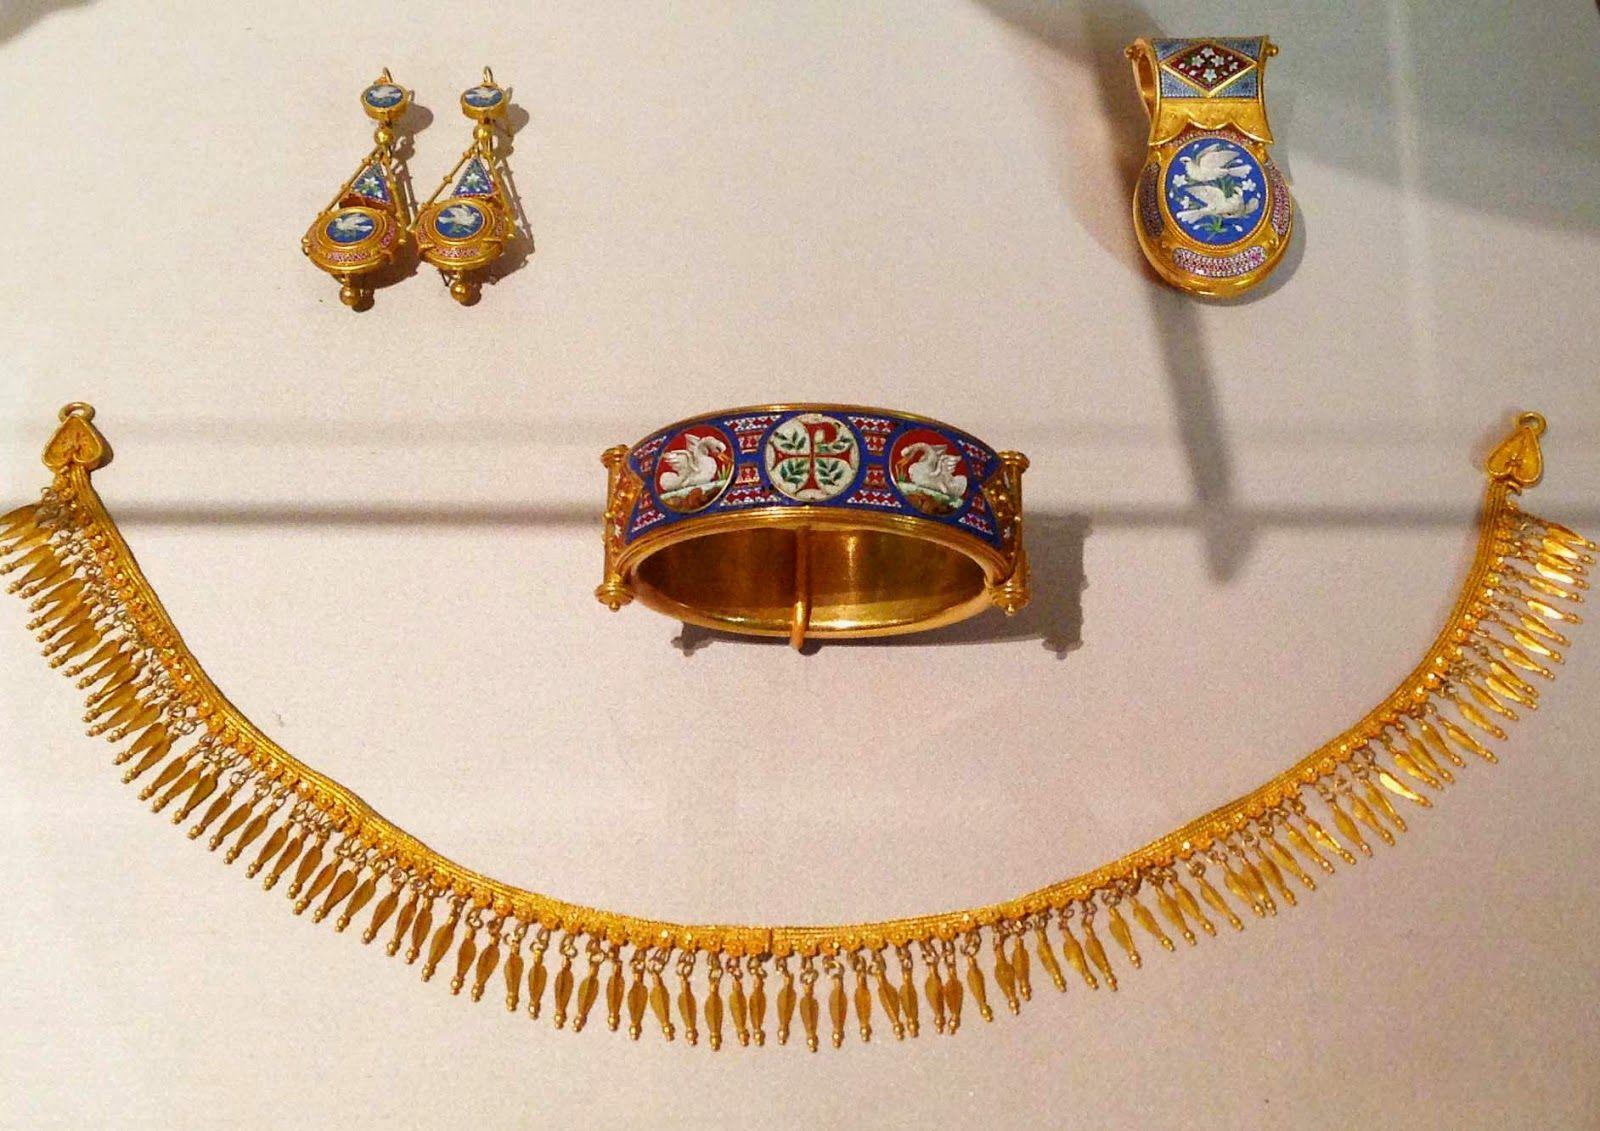 Gilded new york exhibit etruscan jewelry gems exhibition